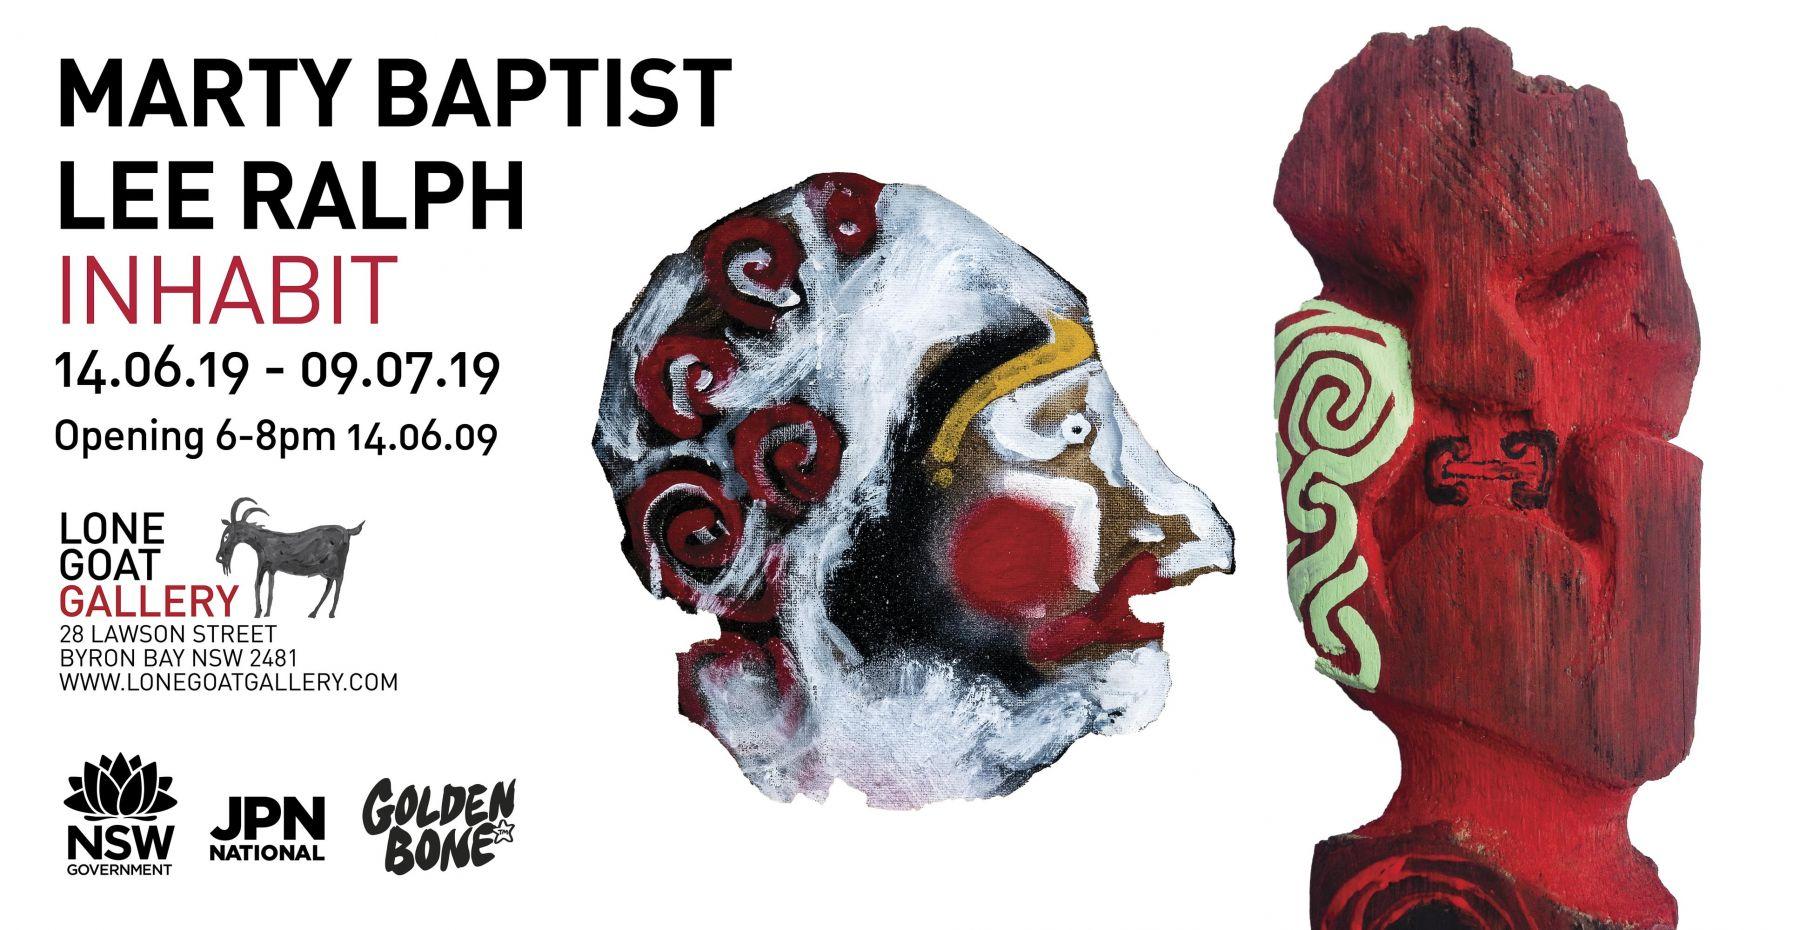 Marty Baptist & lee Ralph invitation for Inhabit exhibition